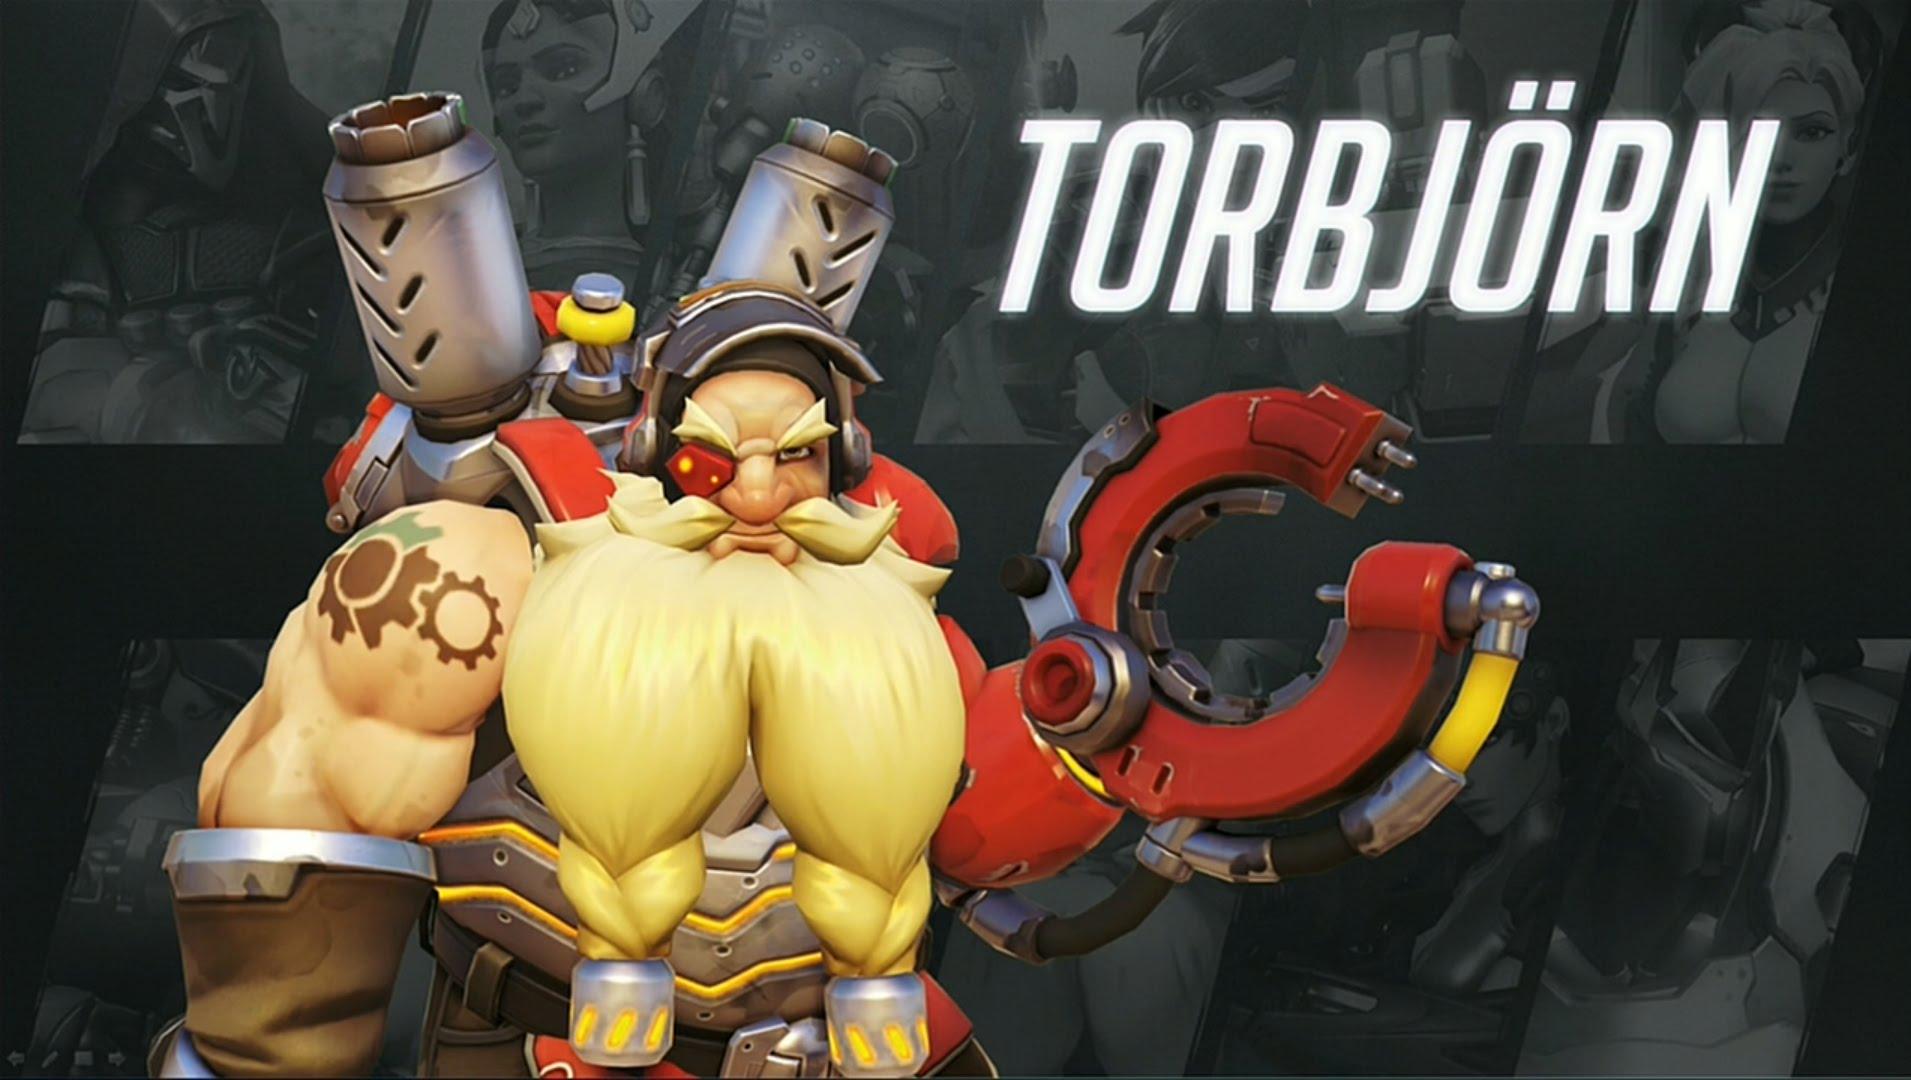 Overwatch : Torbjörn Wallpapers hd